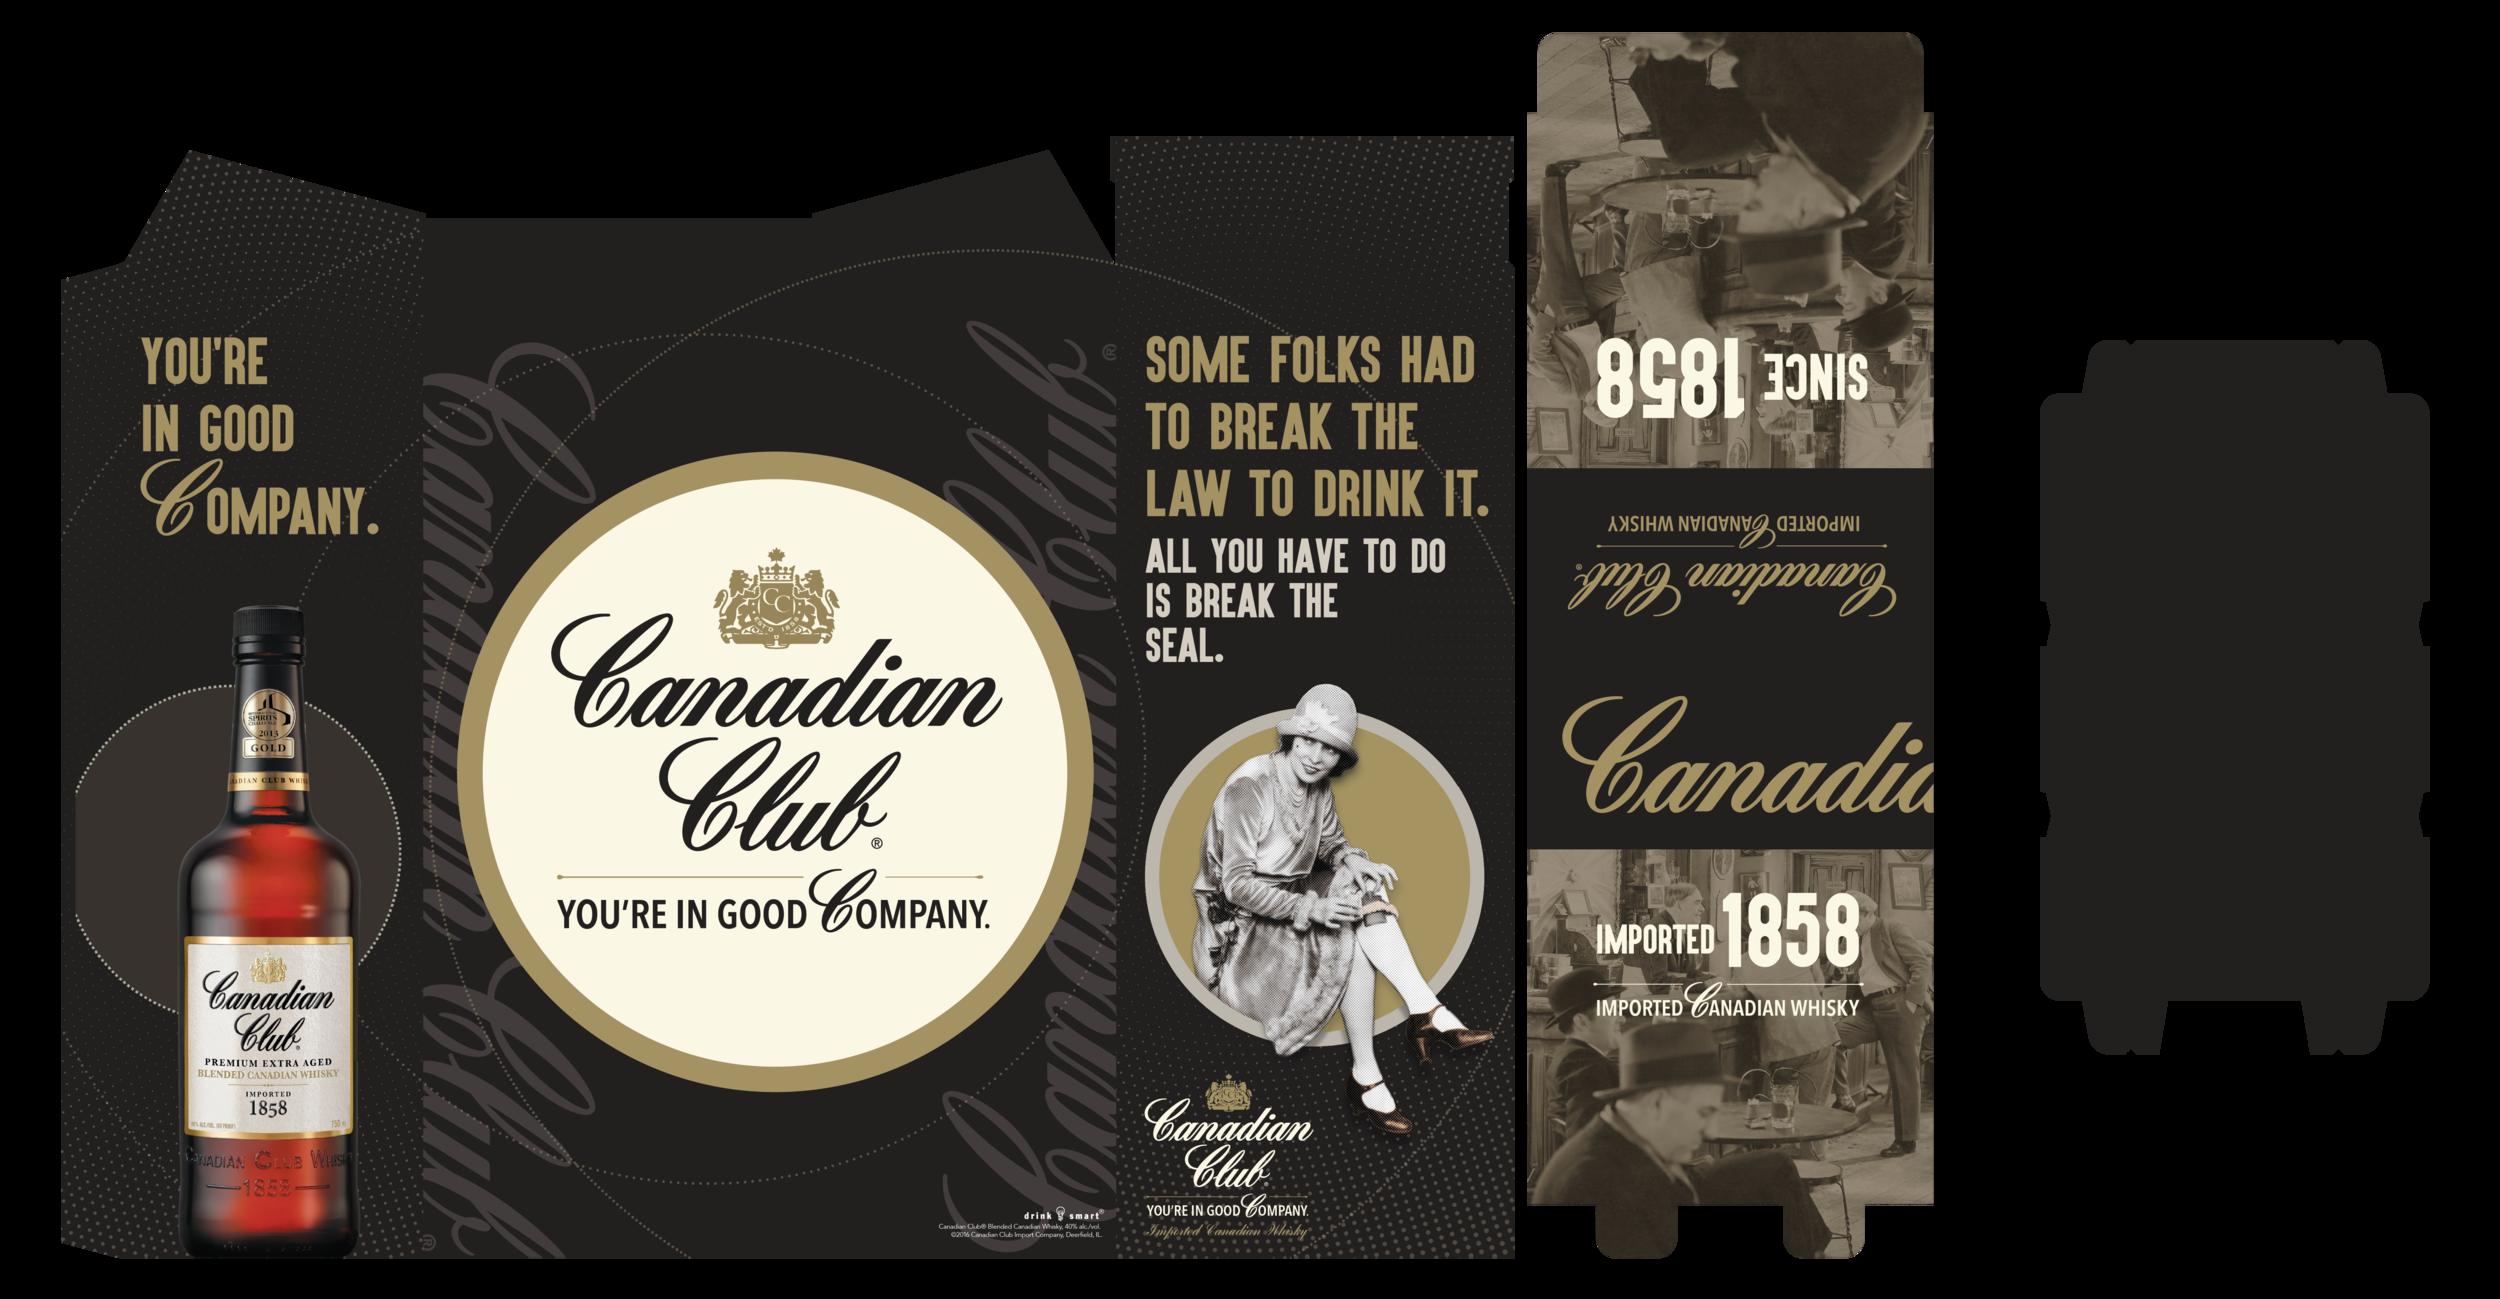 Canadian Club Activation - 1858 3 Case Bin